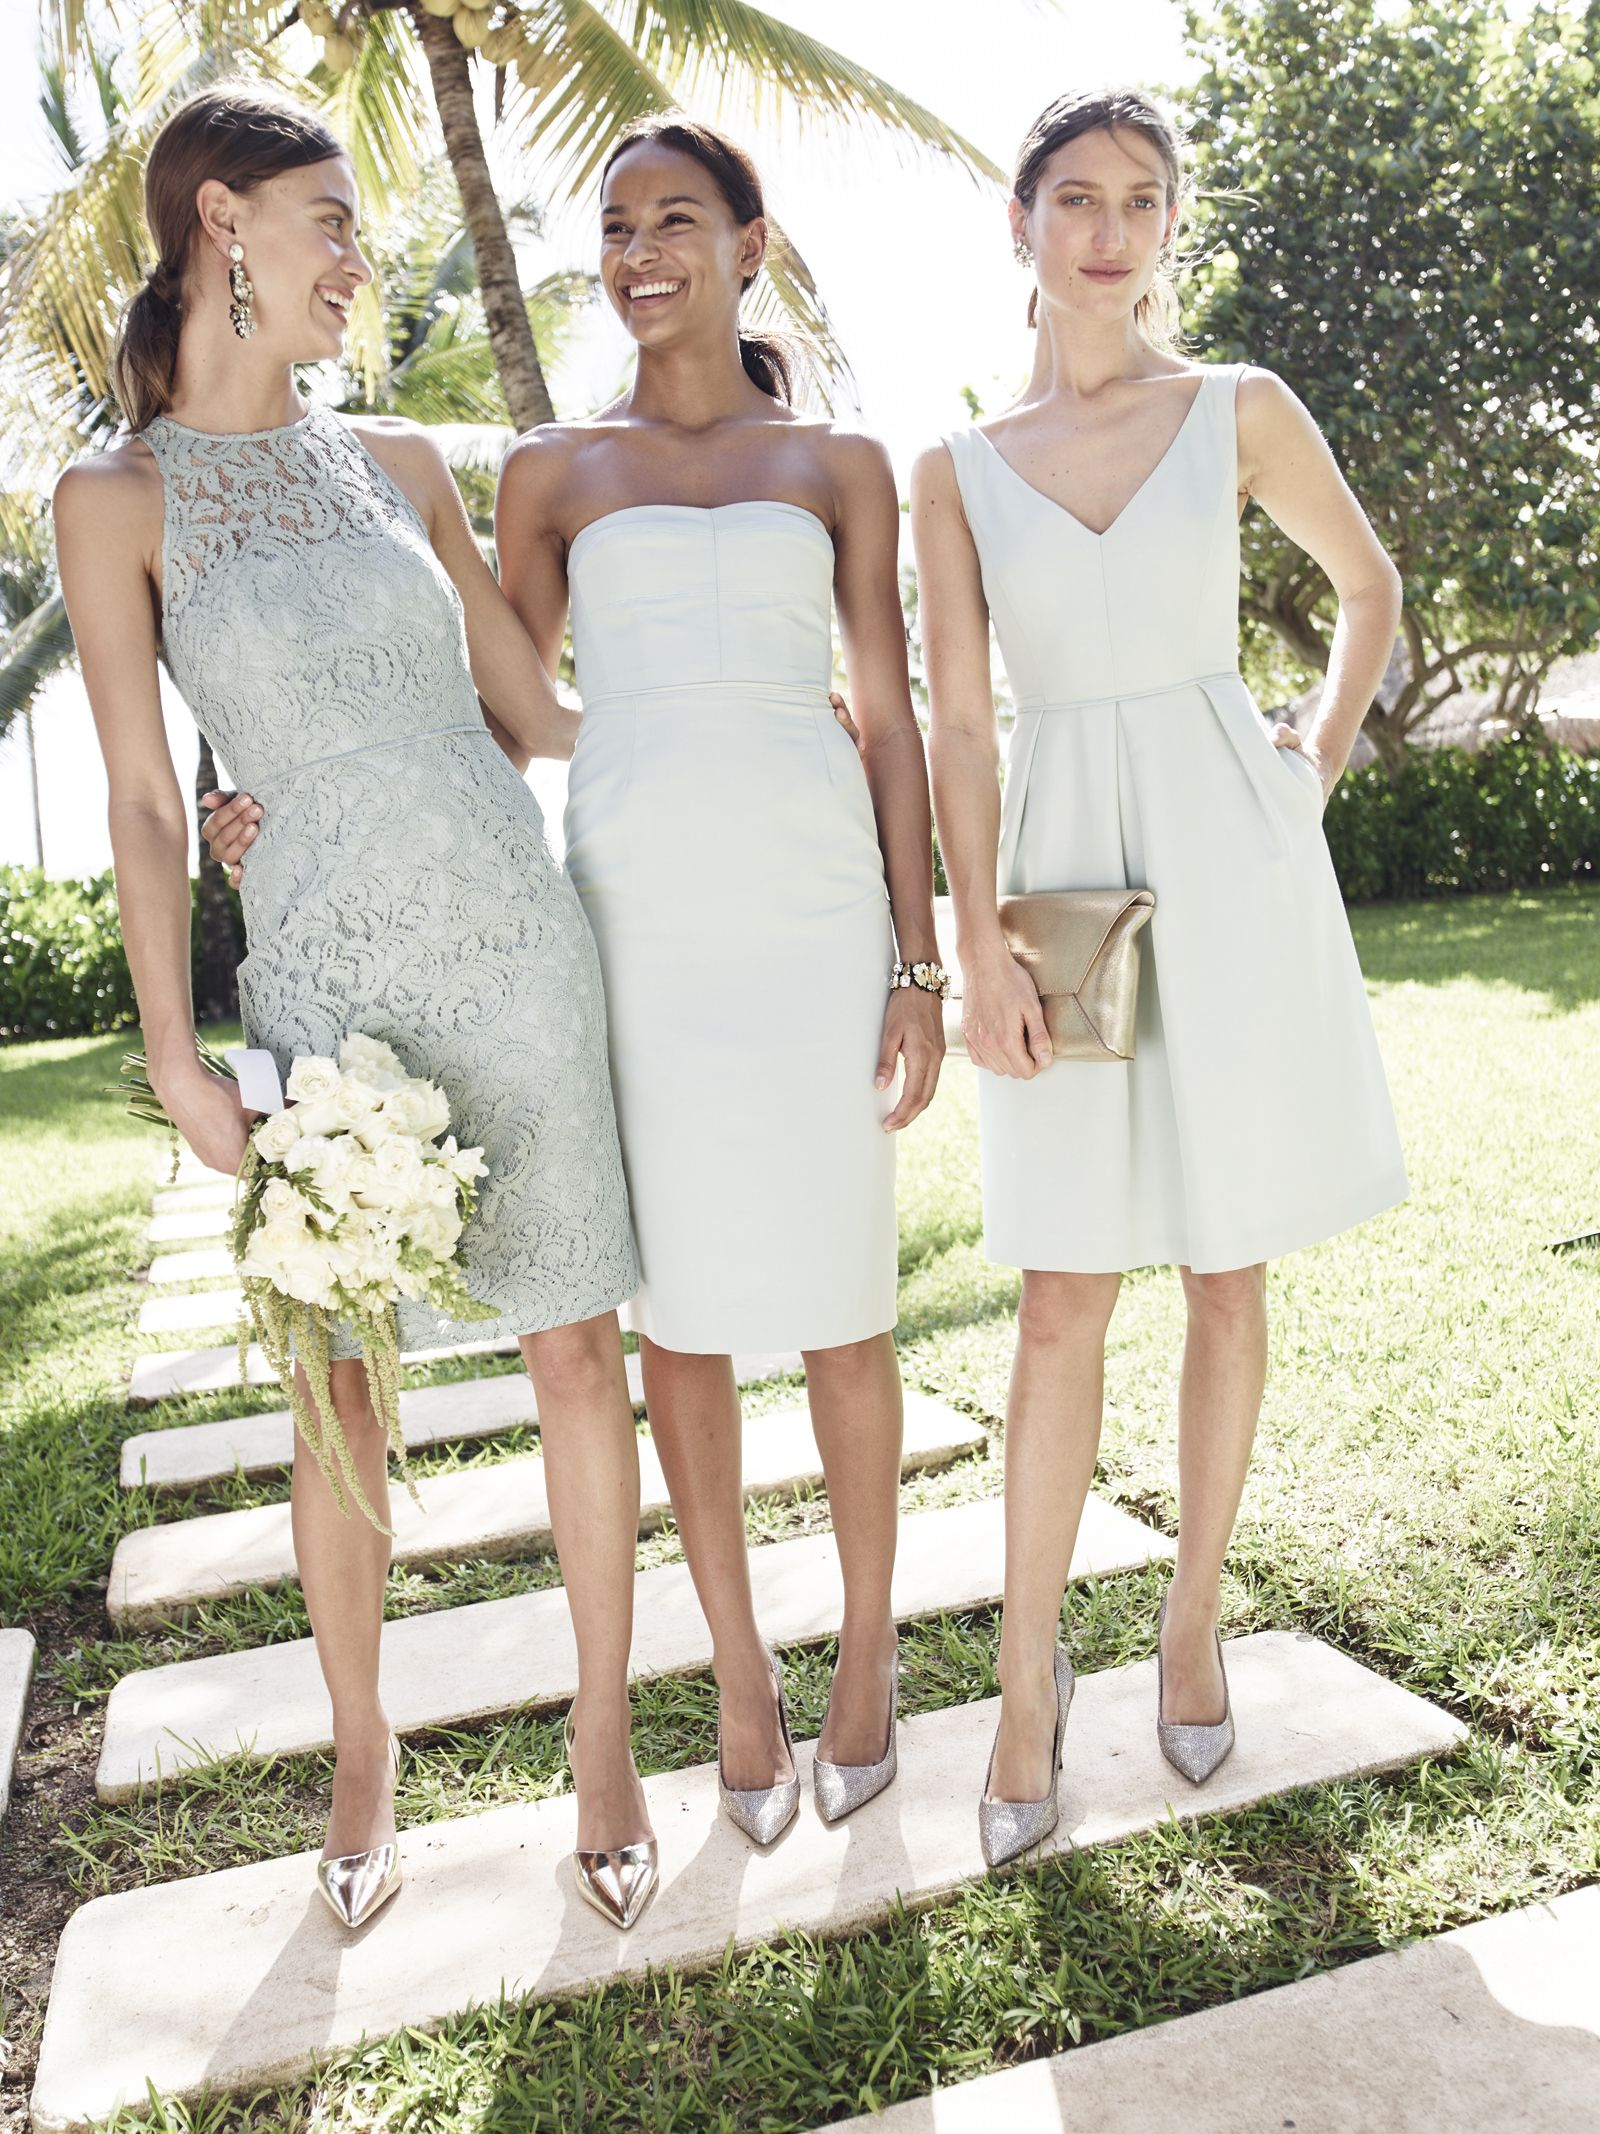 Weddings Parties J Crew Women S Pamela Dress In Leavers Lace Crystal Fabric